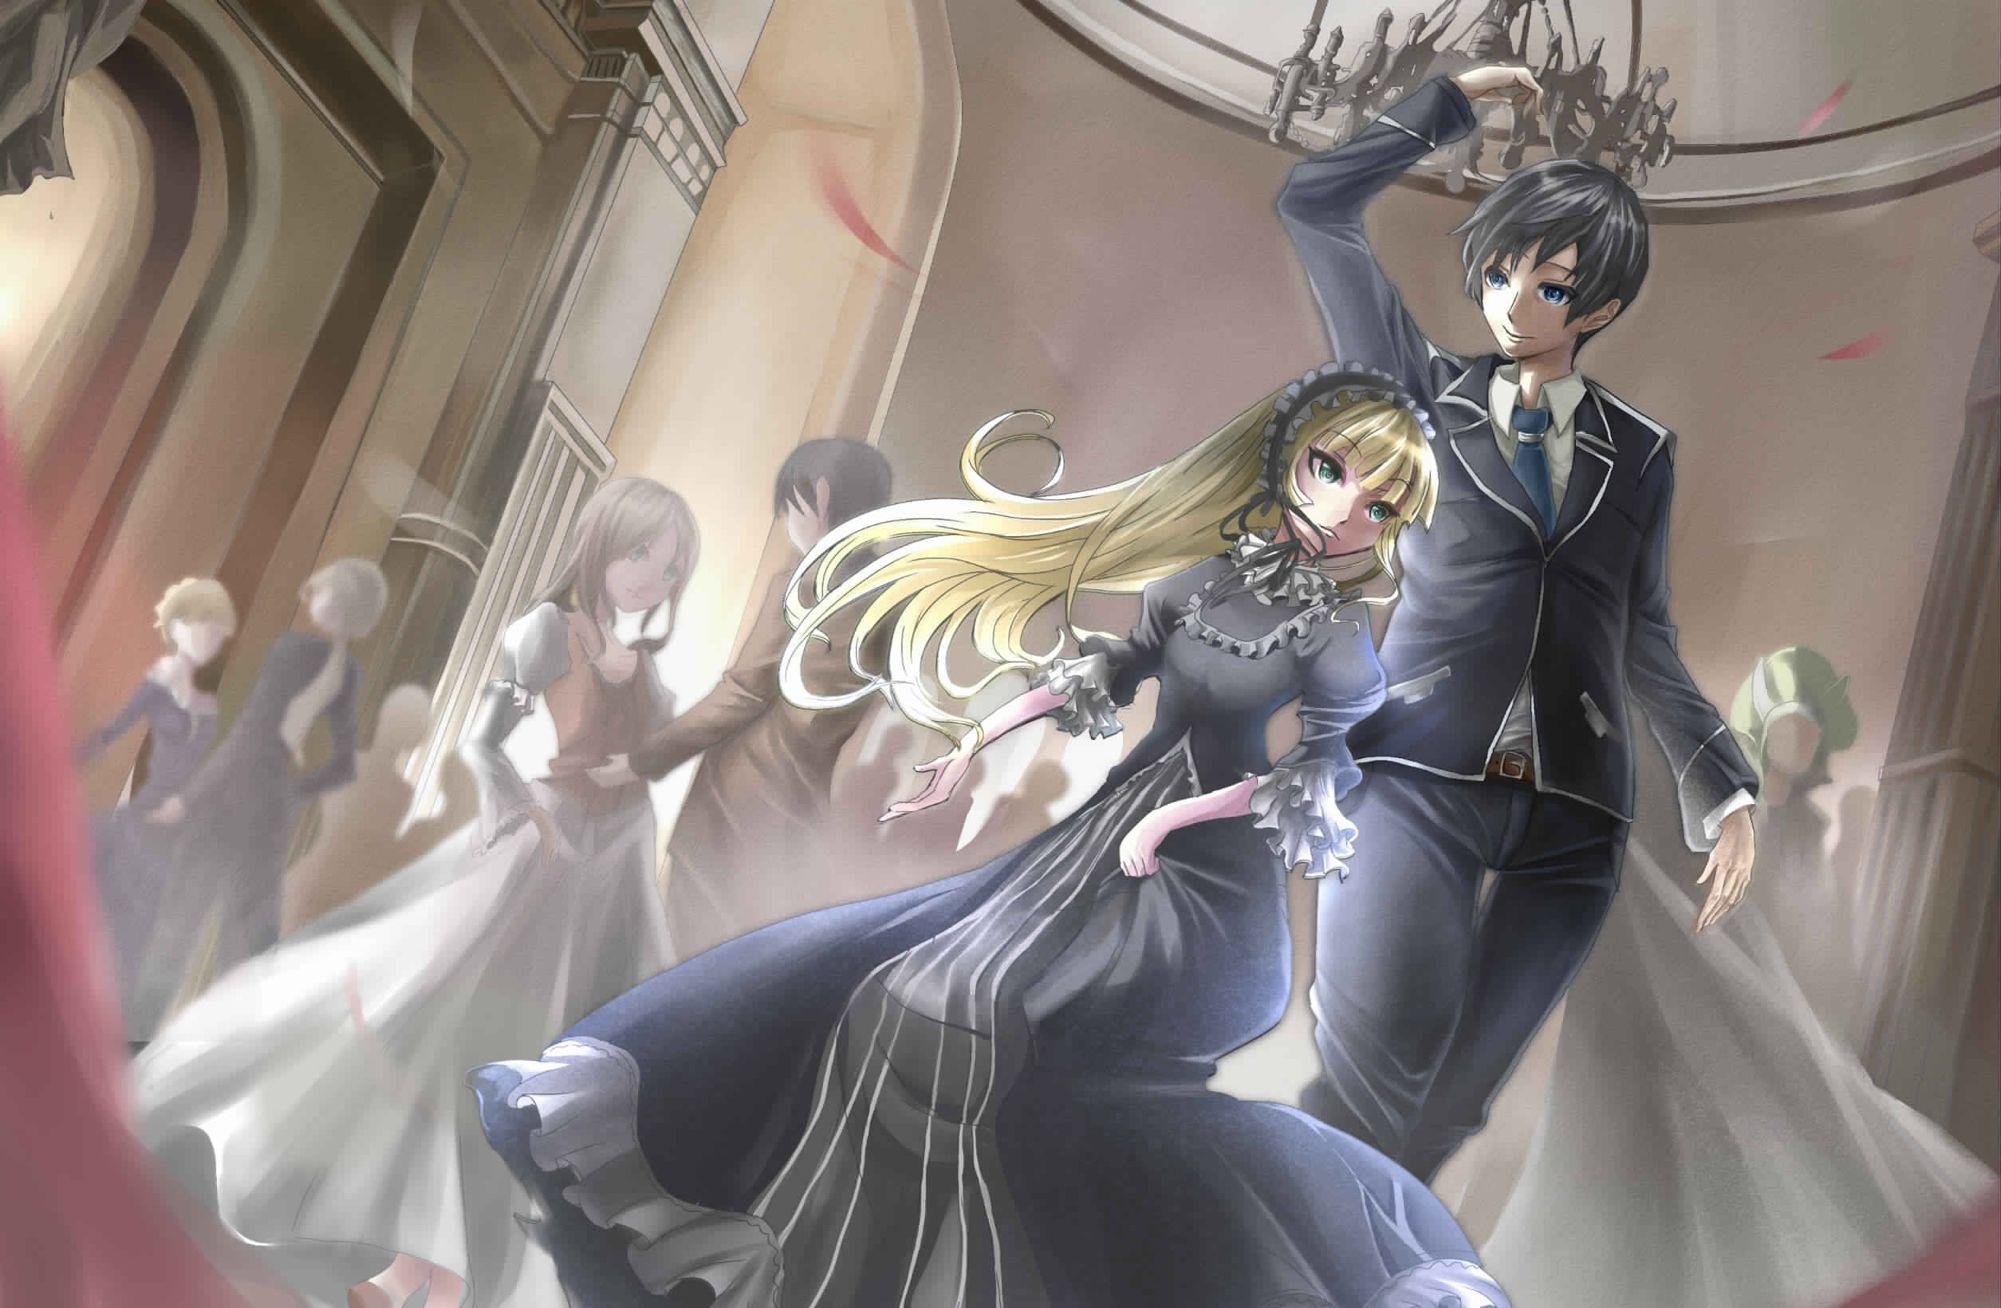 Victorique and Kazuya Gosick Gosick victorique, Anime